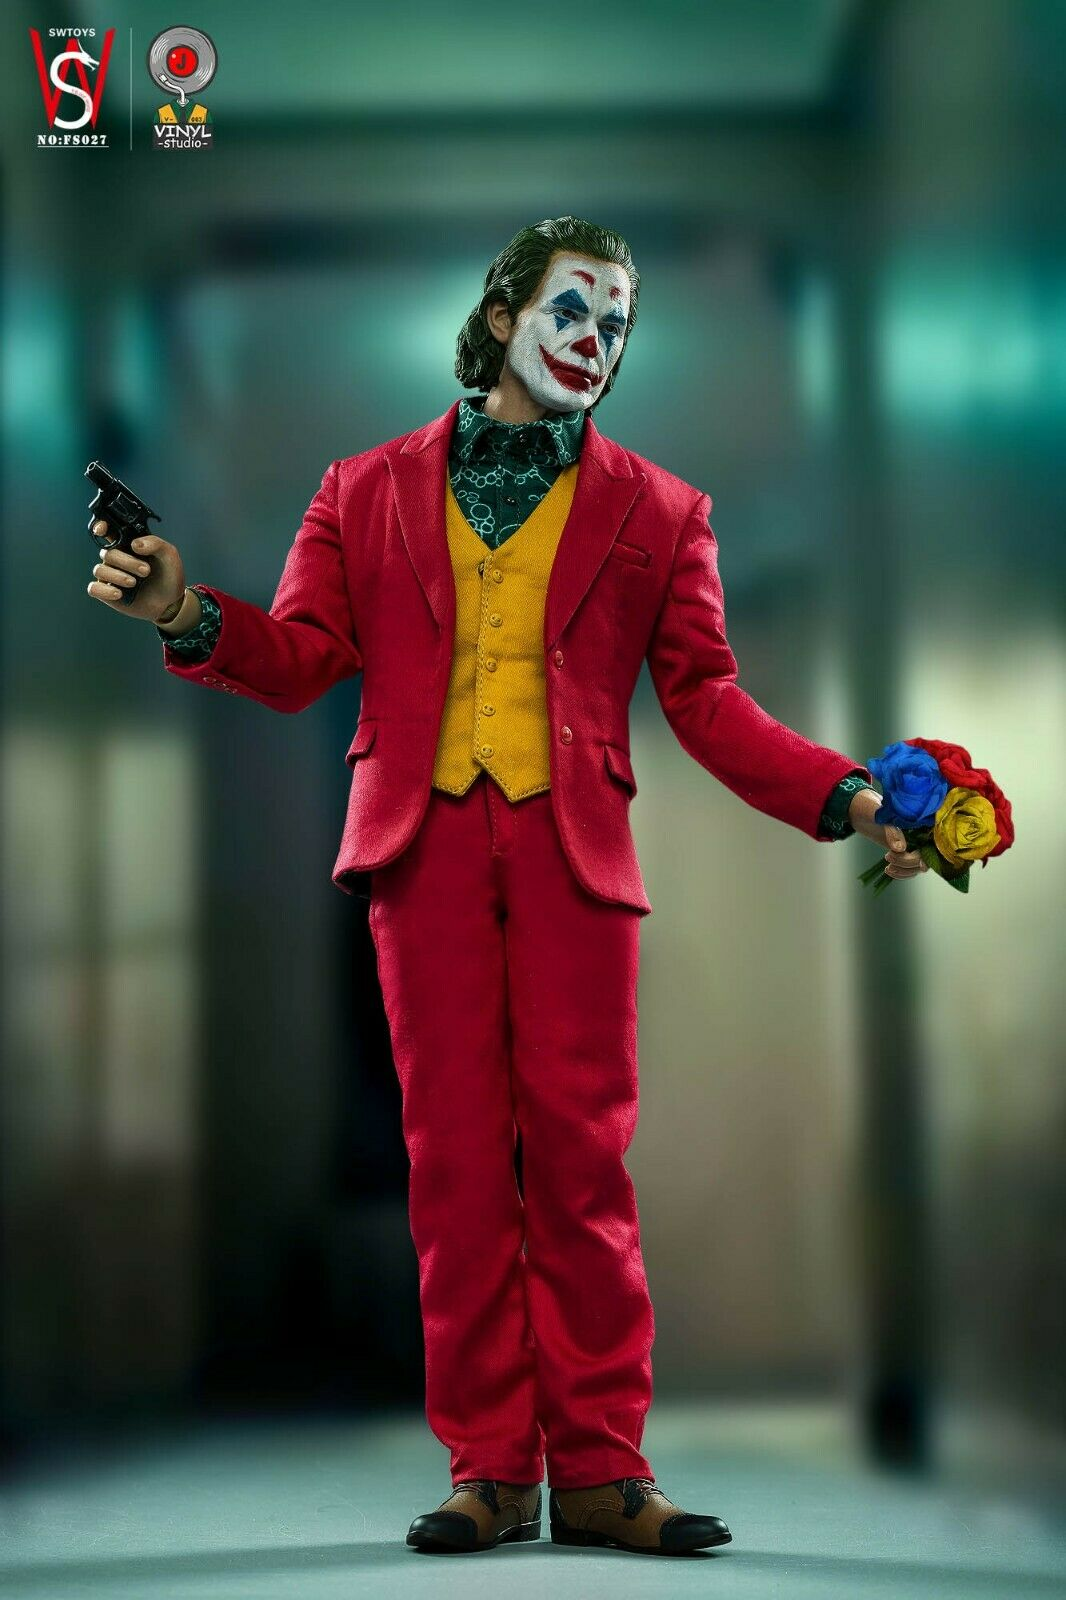 1 6 WOO leksaks WO-001 Joker Joaquin Phoenix Dress Suit Version Figur